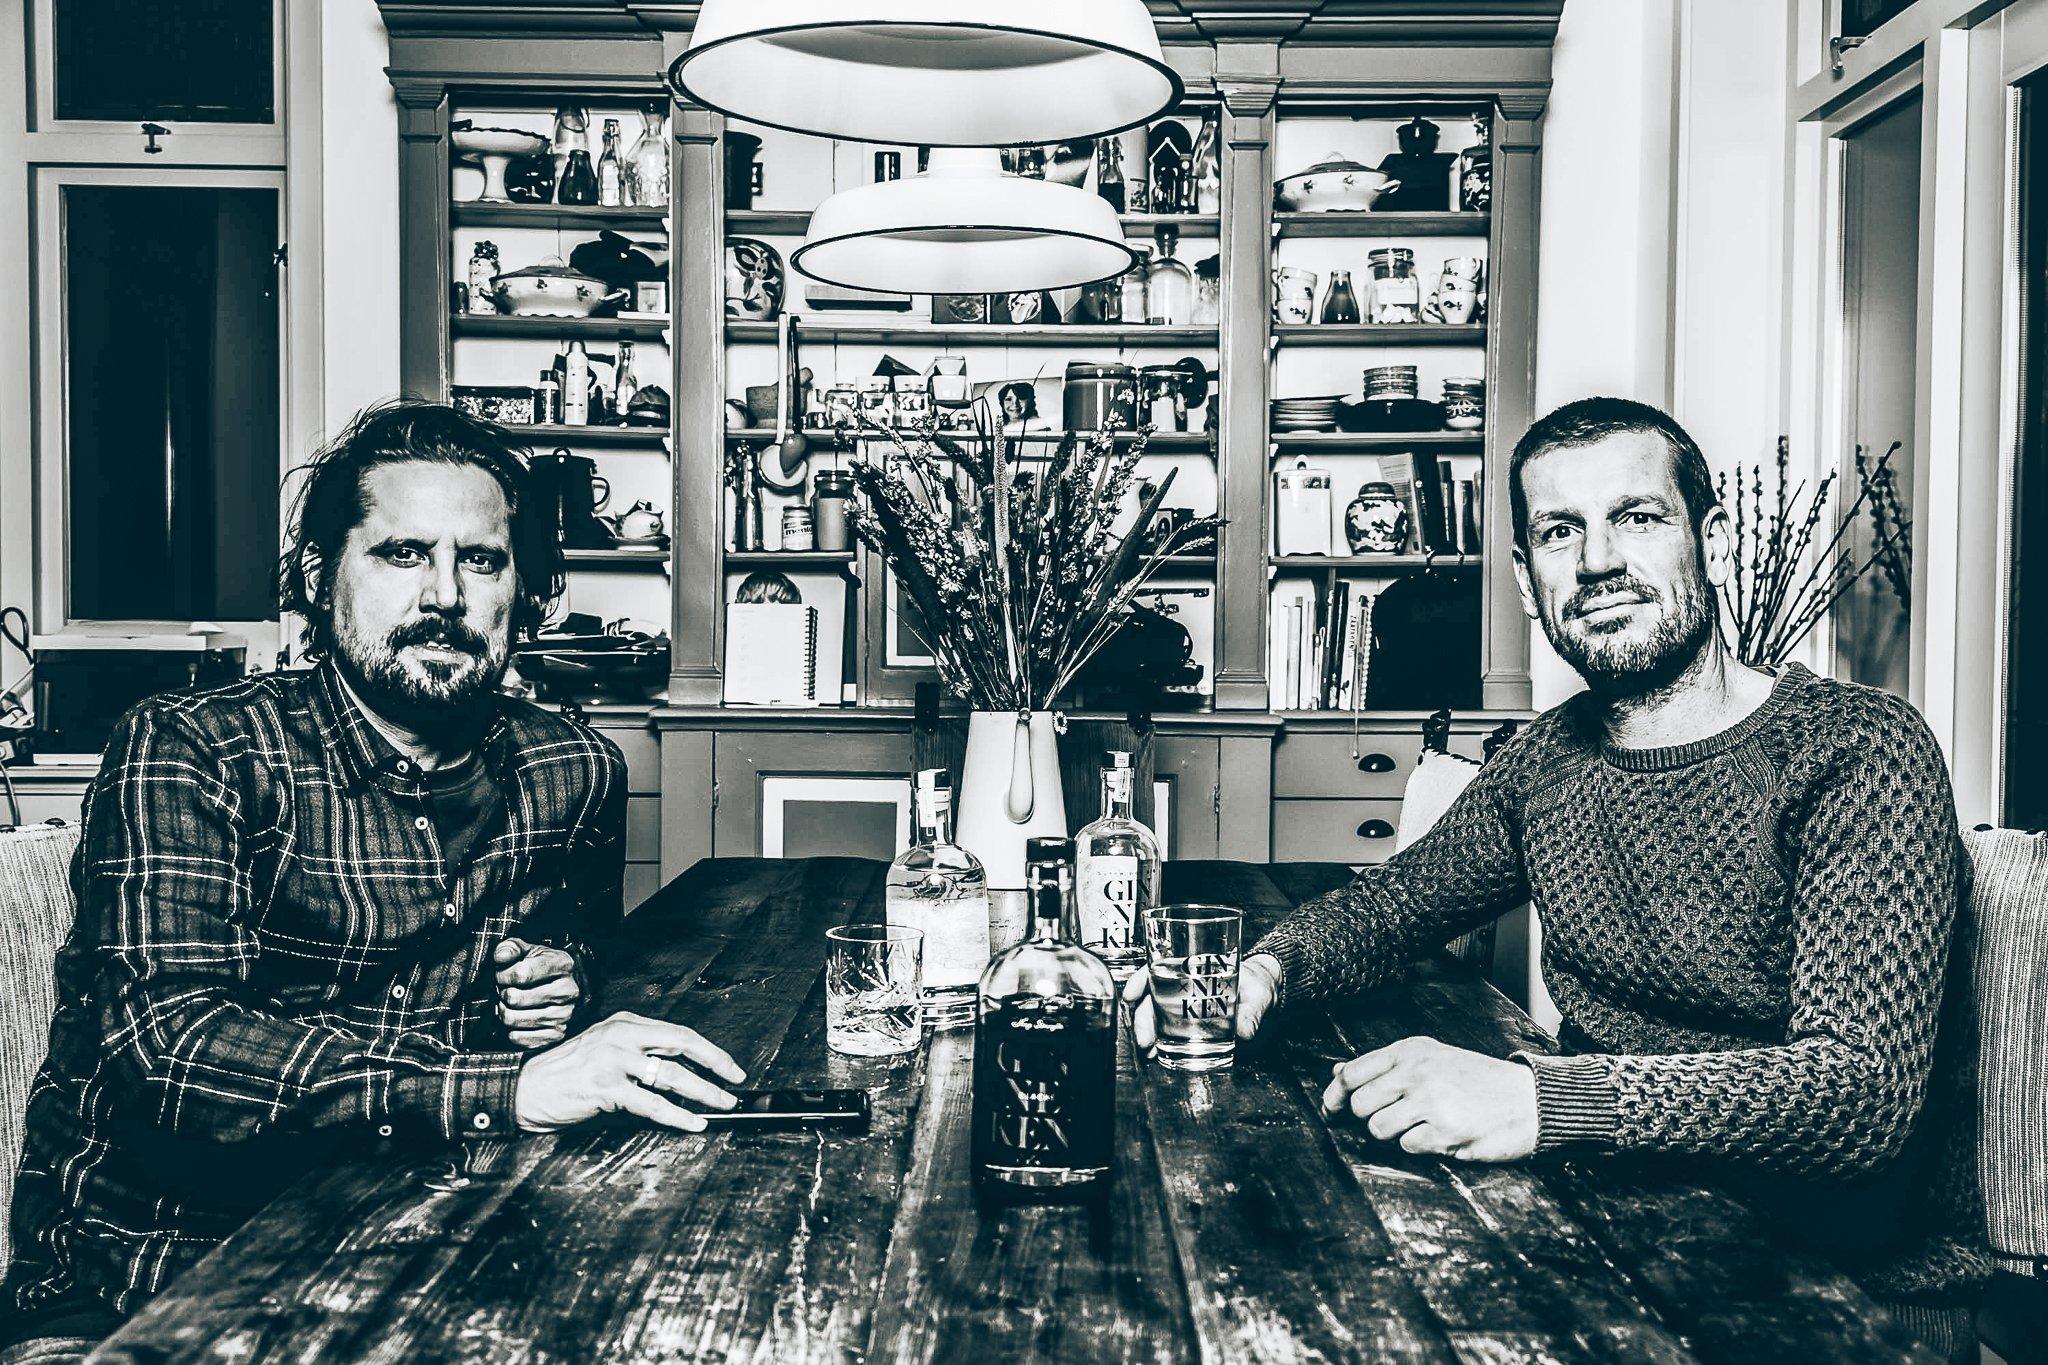 Reijer en Tom, Founders van Ginneken Gin, Alles over gin.